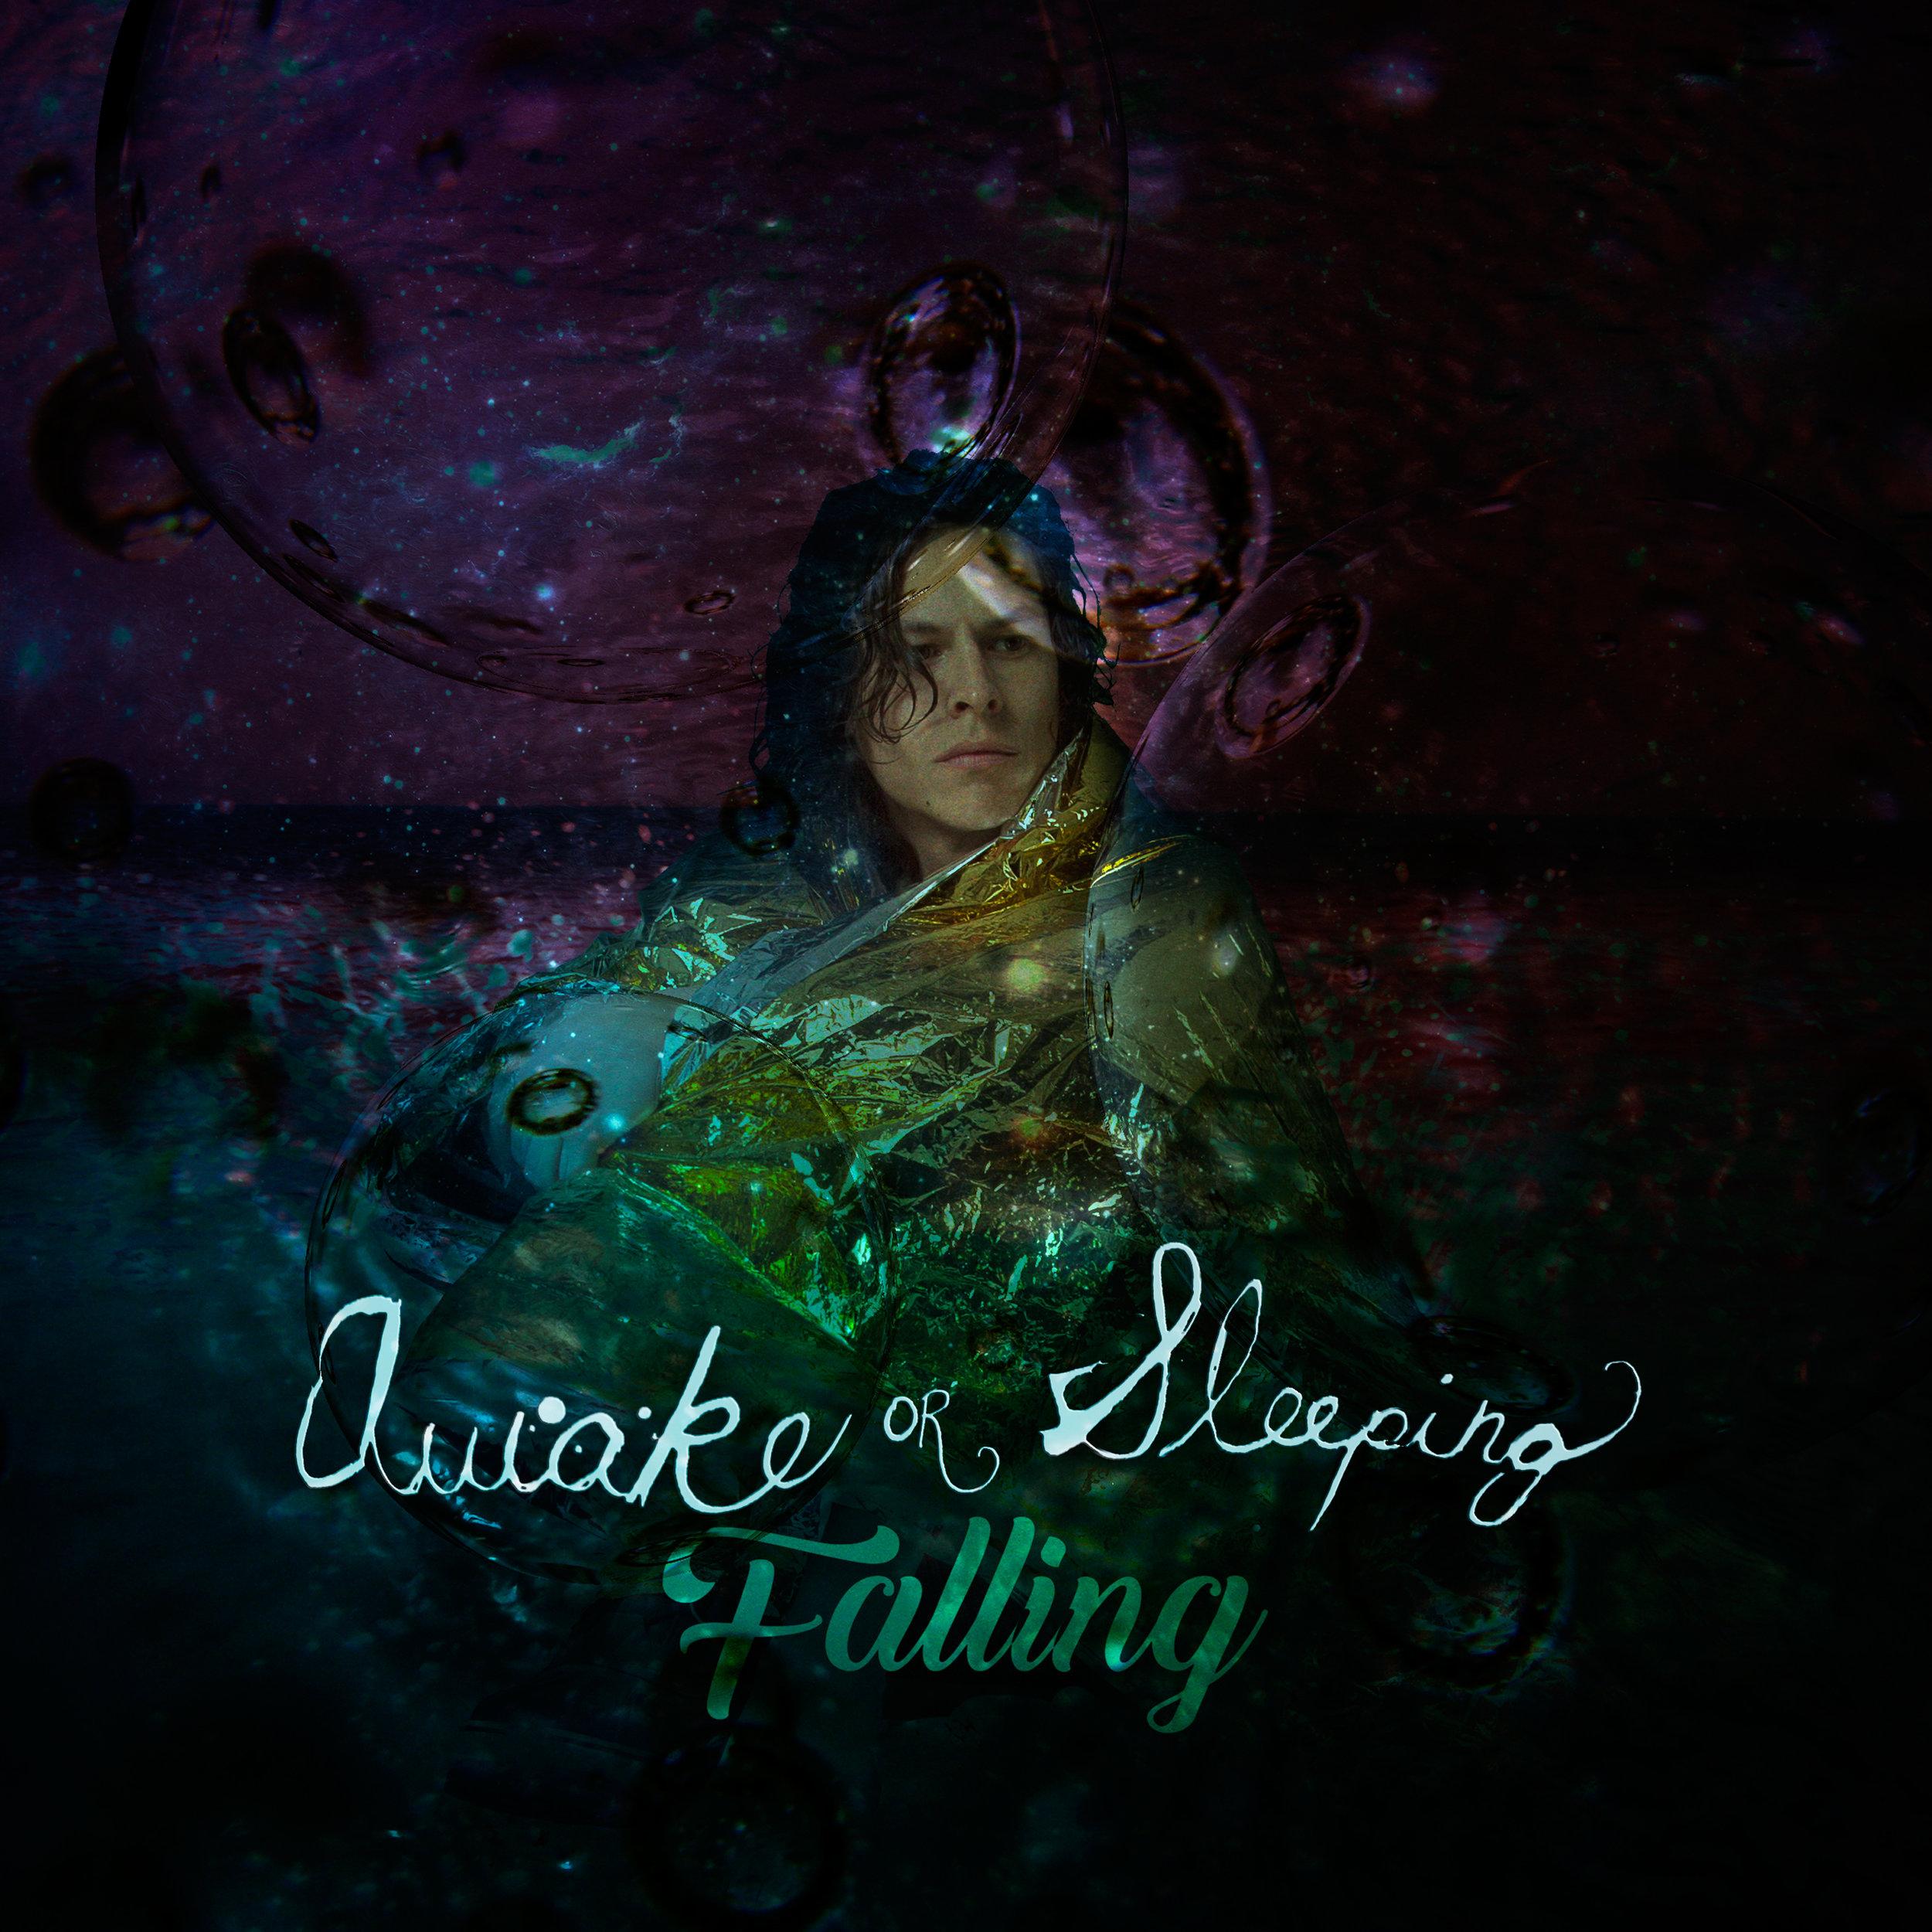 Awake-or-Sleeping-Falling-Cover.jpg